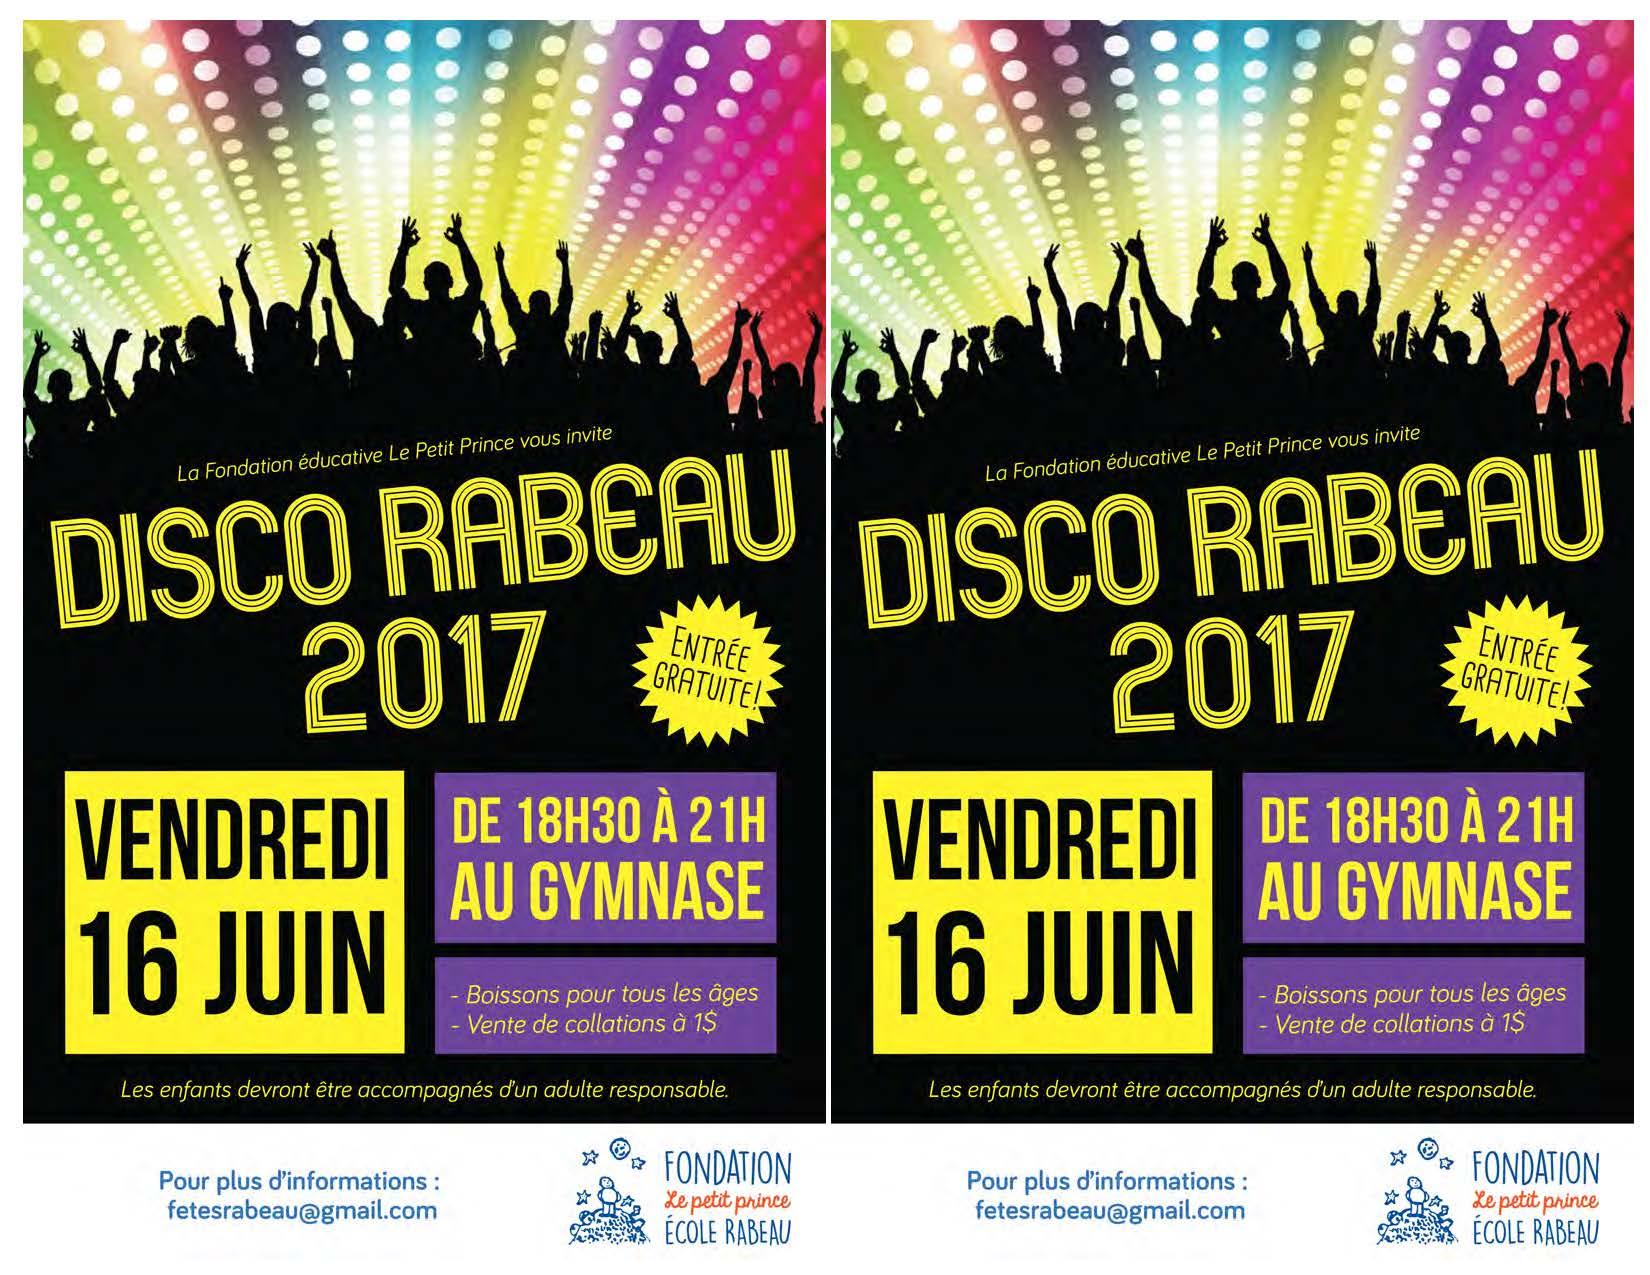 Disco Rabeau